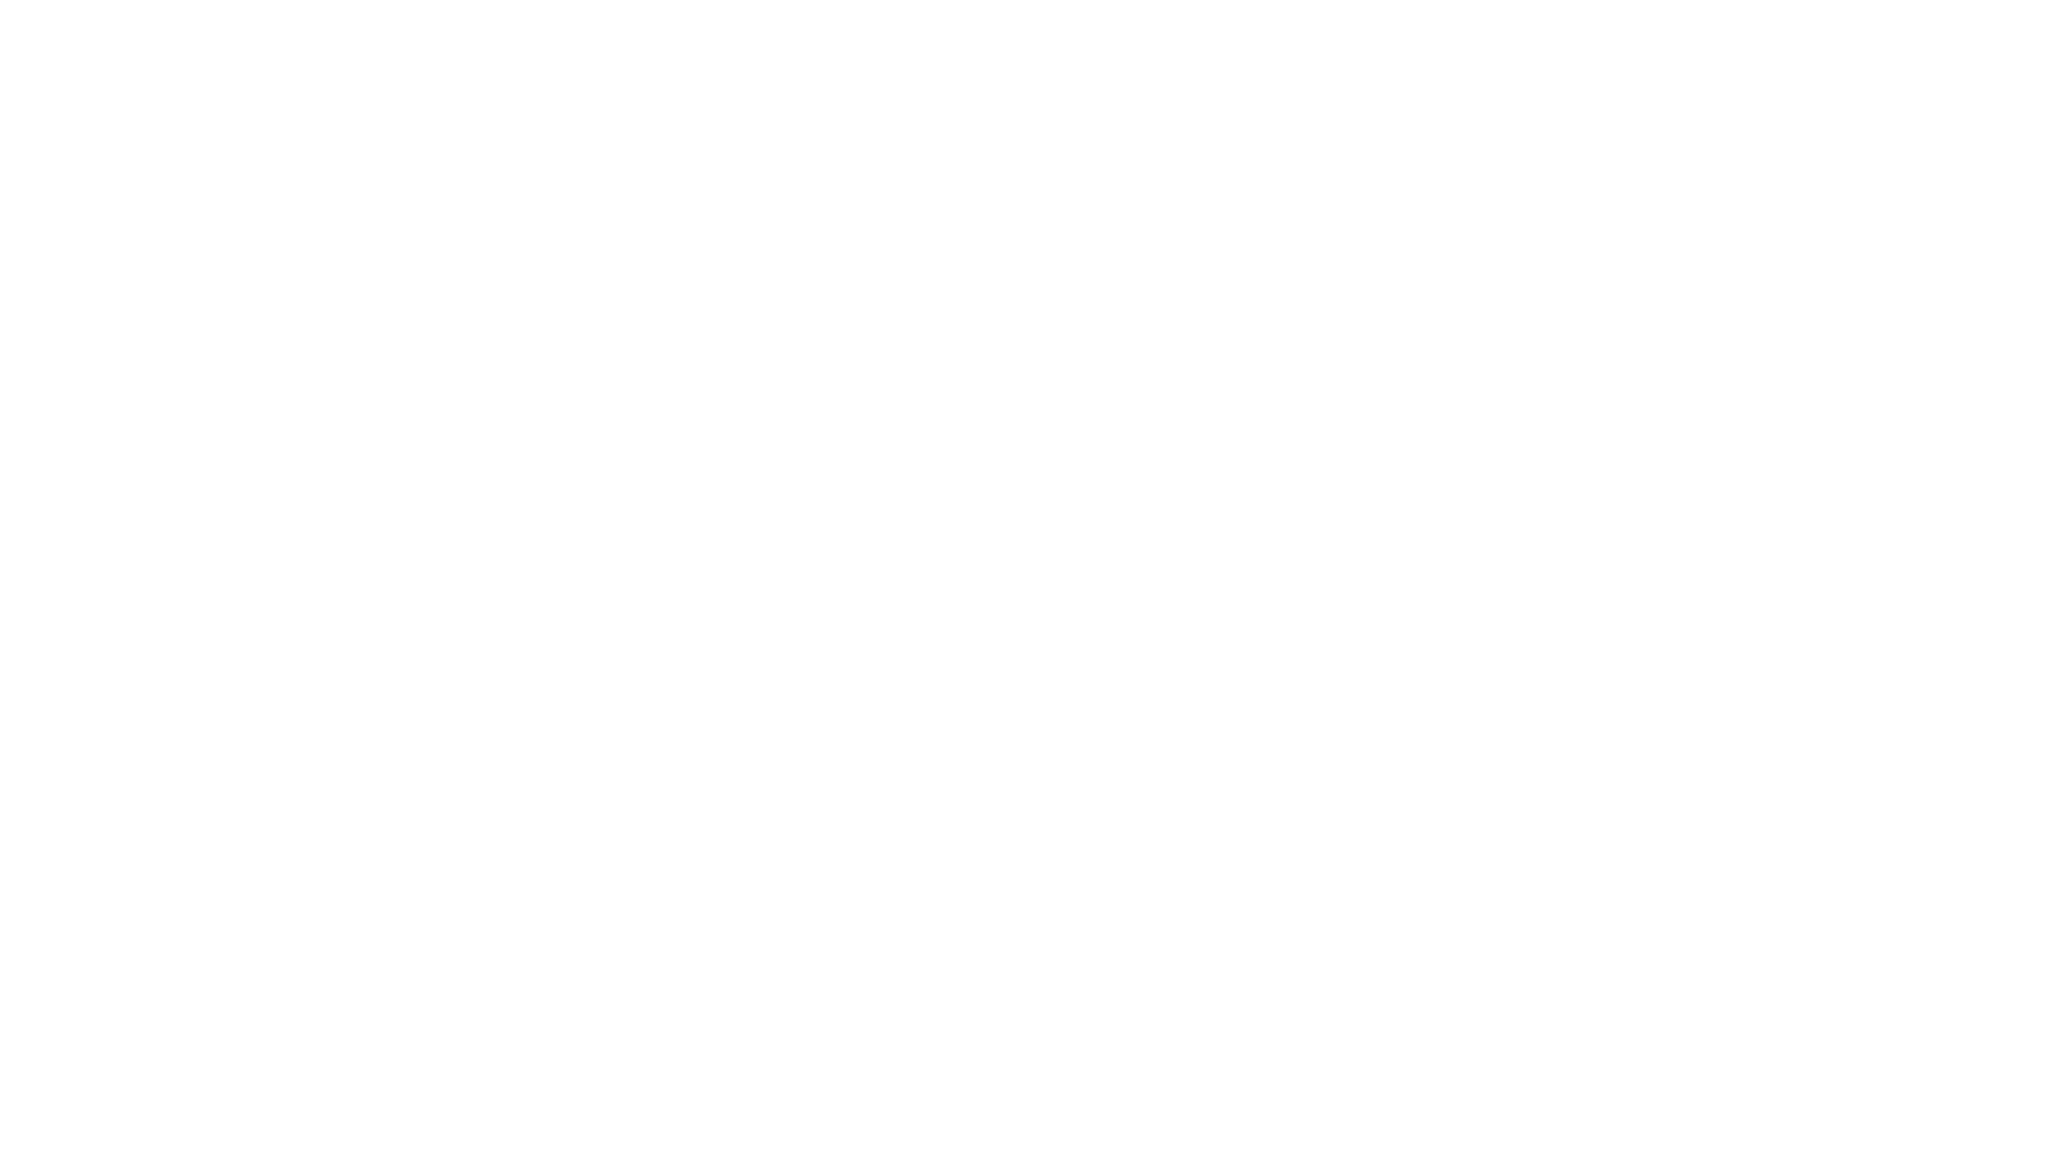 hill-chart-1